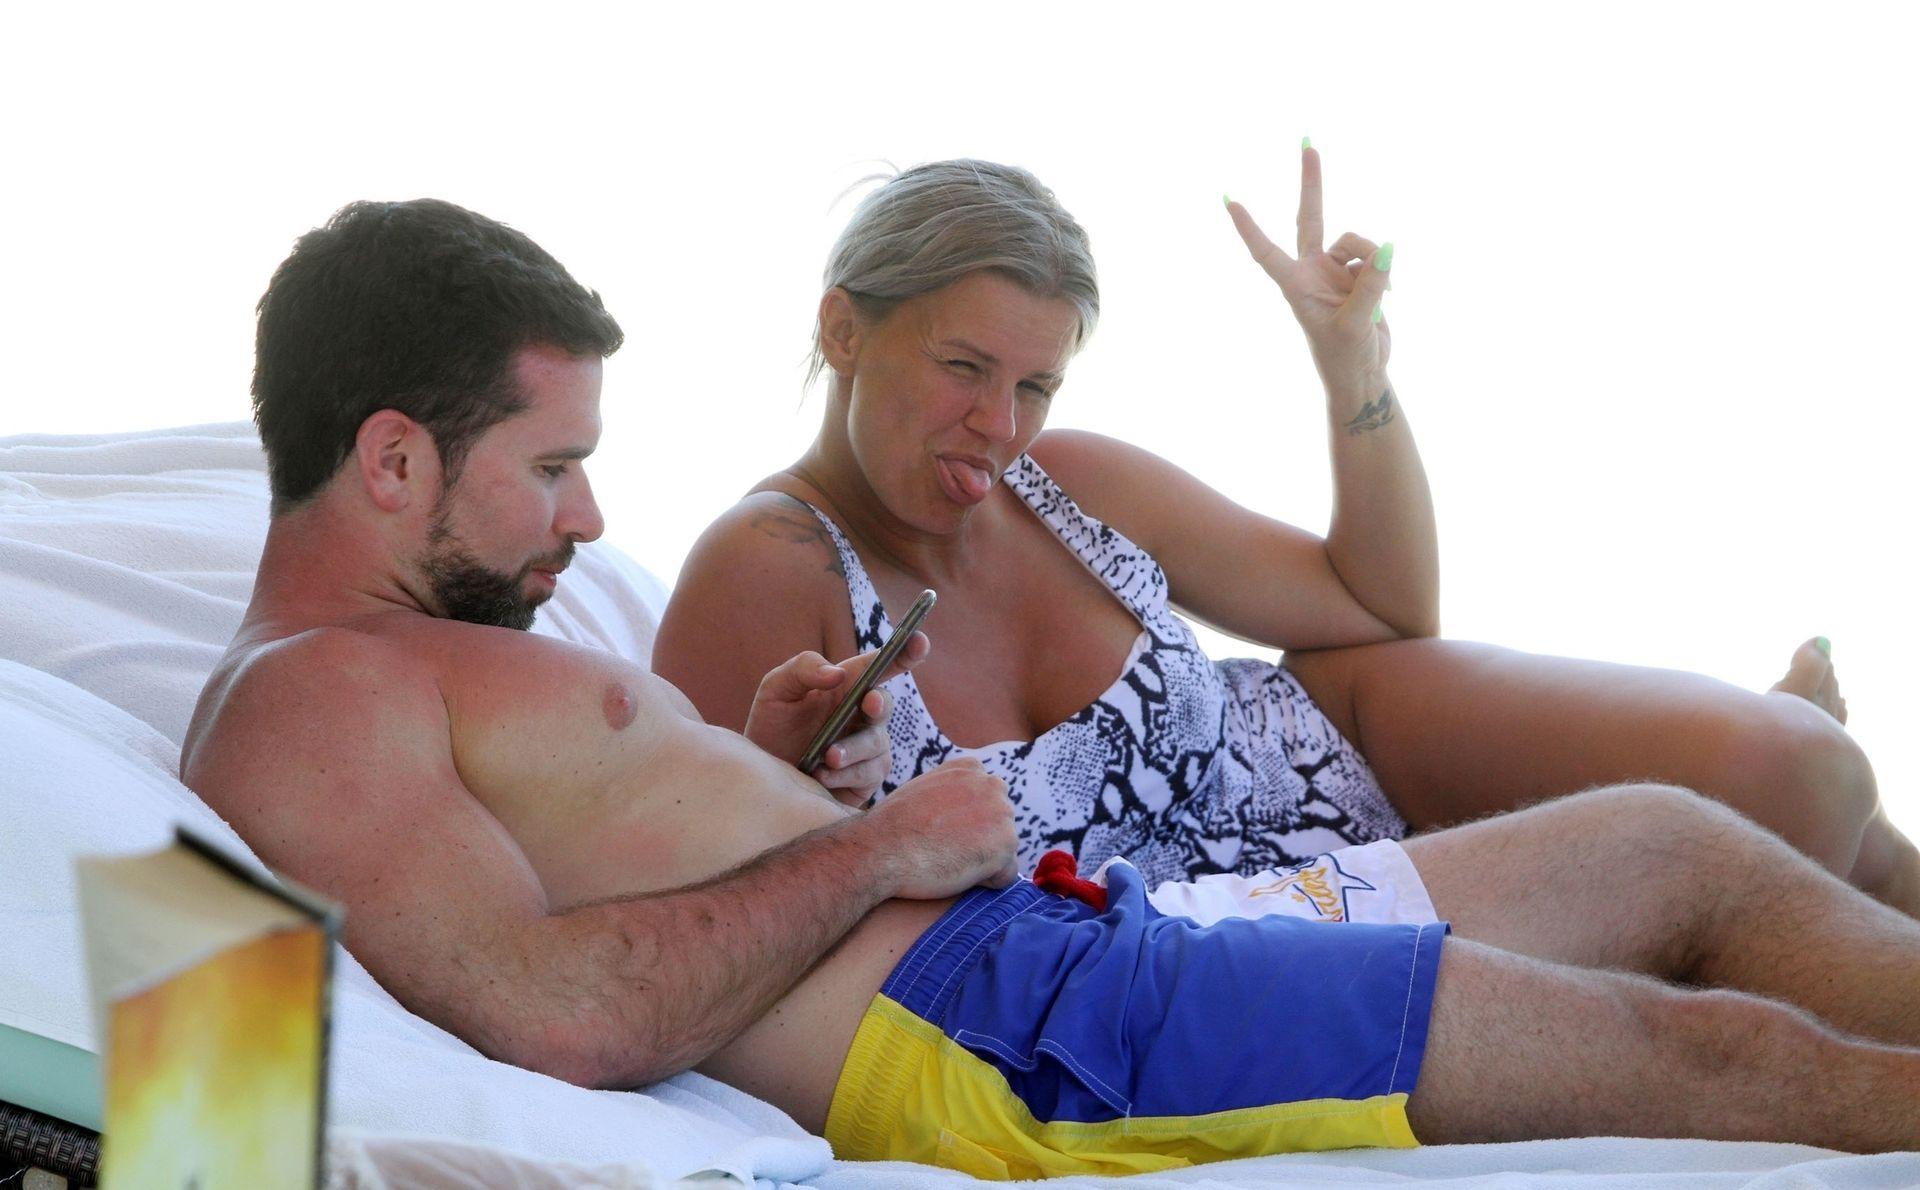 Kerry Katona & Ryan Mahoney Hit The Beach On Holiday At Their Luxury 5 Star Resort Ayada Maldives 0036